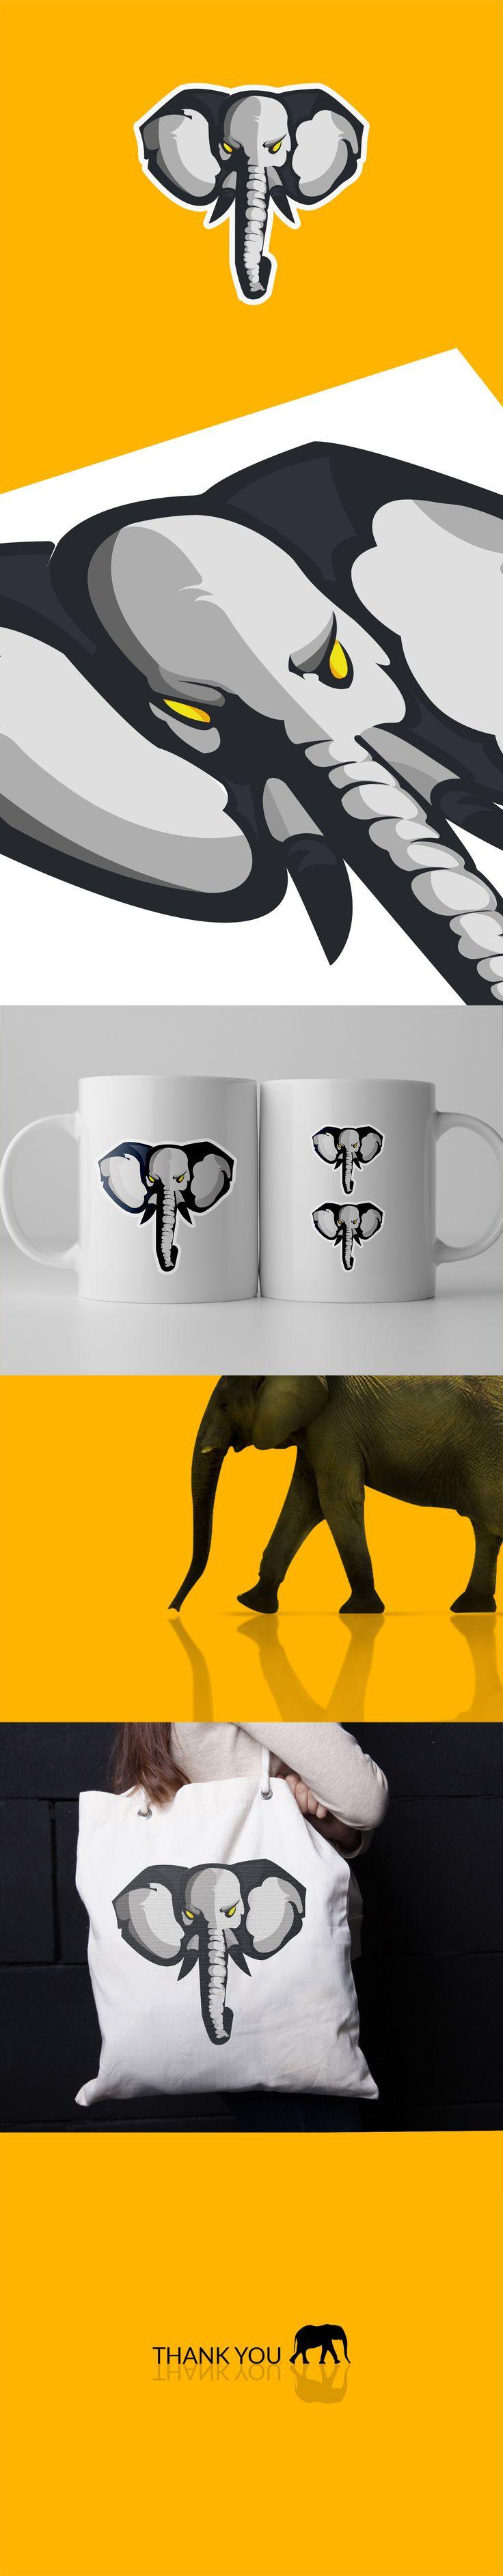 "Popatrz na mój projekt w @Behance: ""Elephant"" https://www.behance.net/gallery/47524081/Elephant"